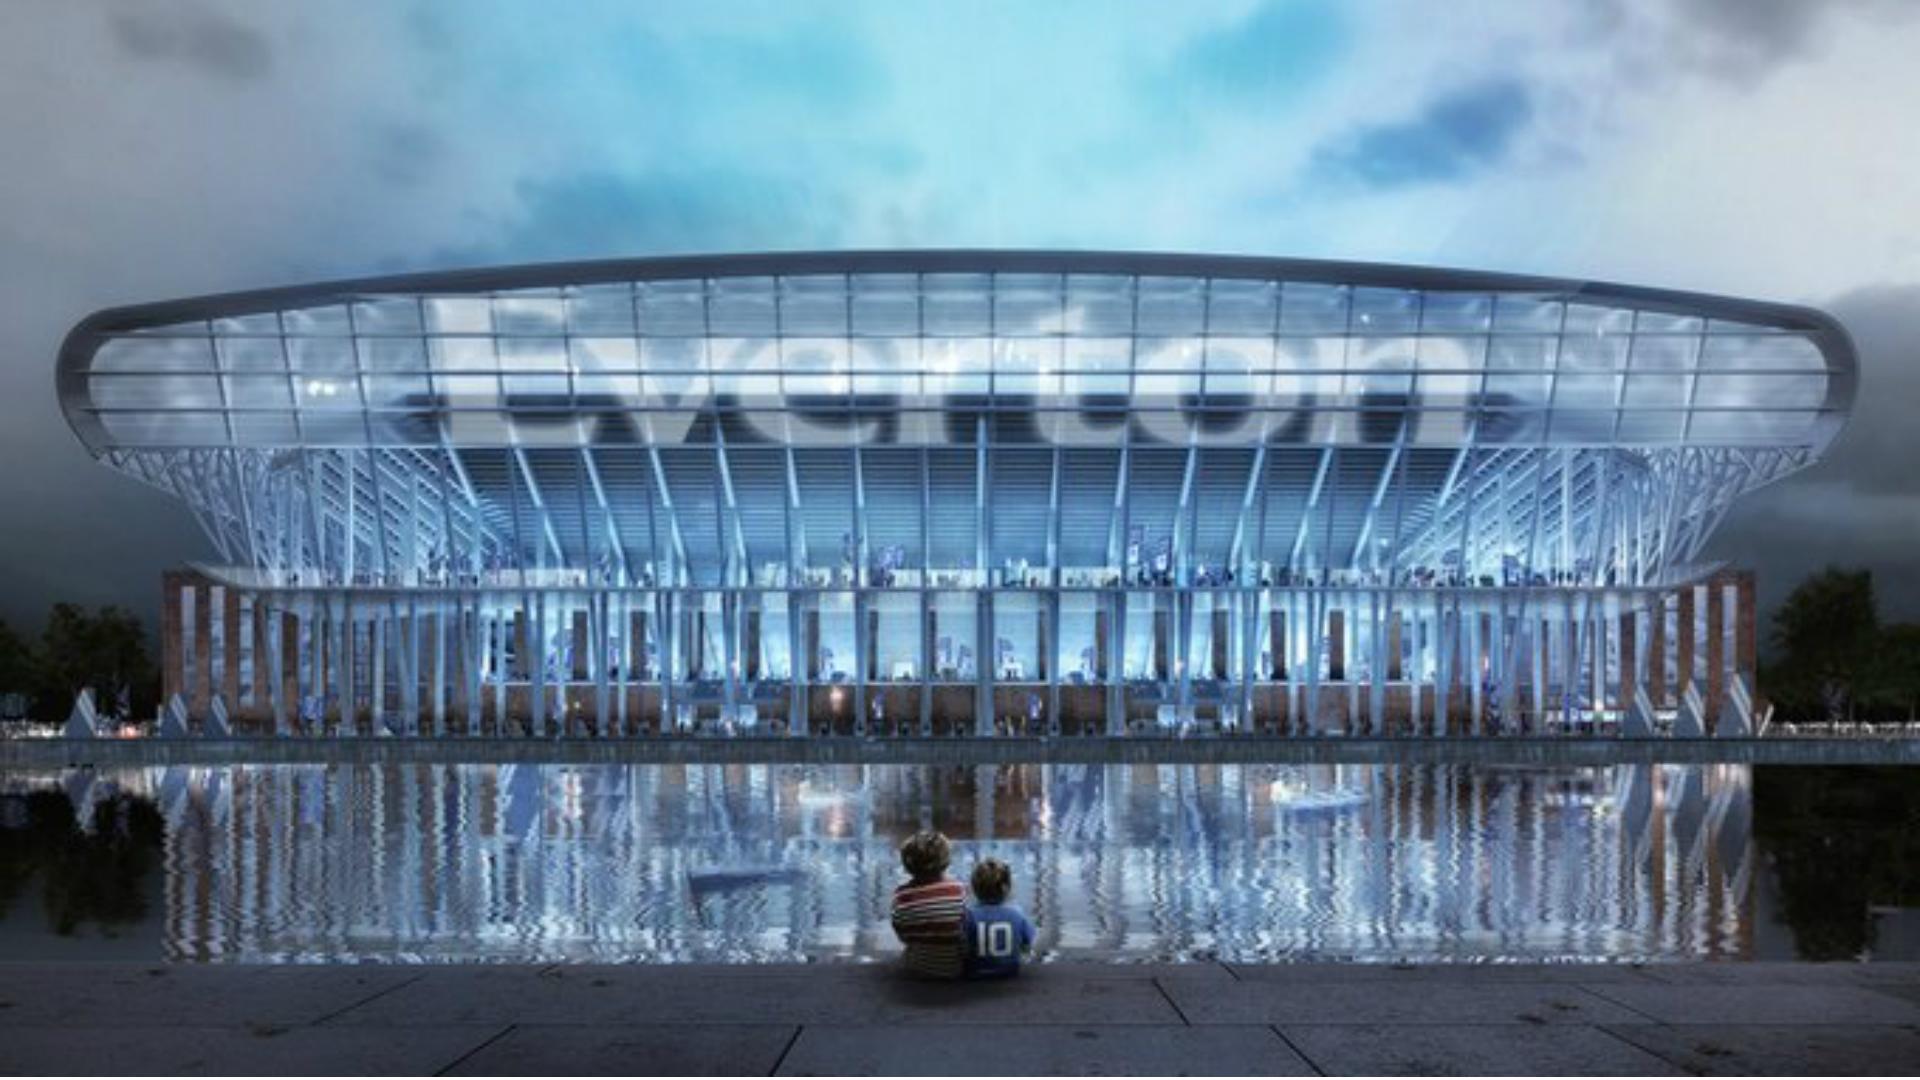 Everton news: Everton unveil 'game-changer' stadium design ...